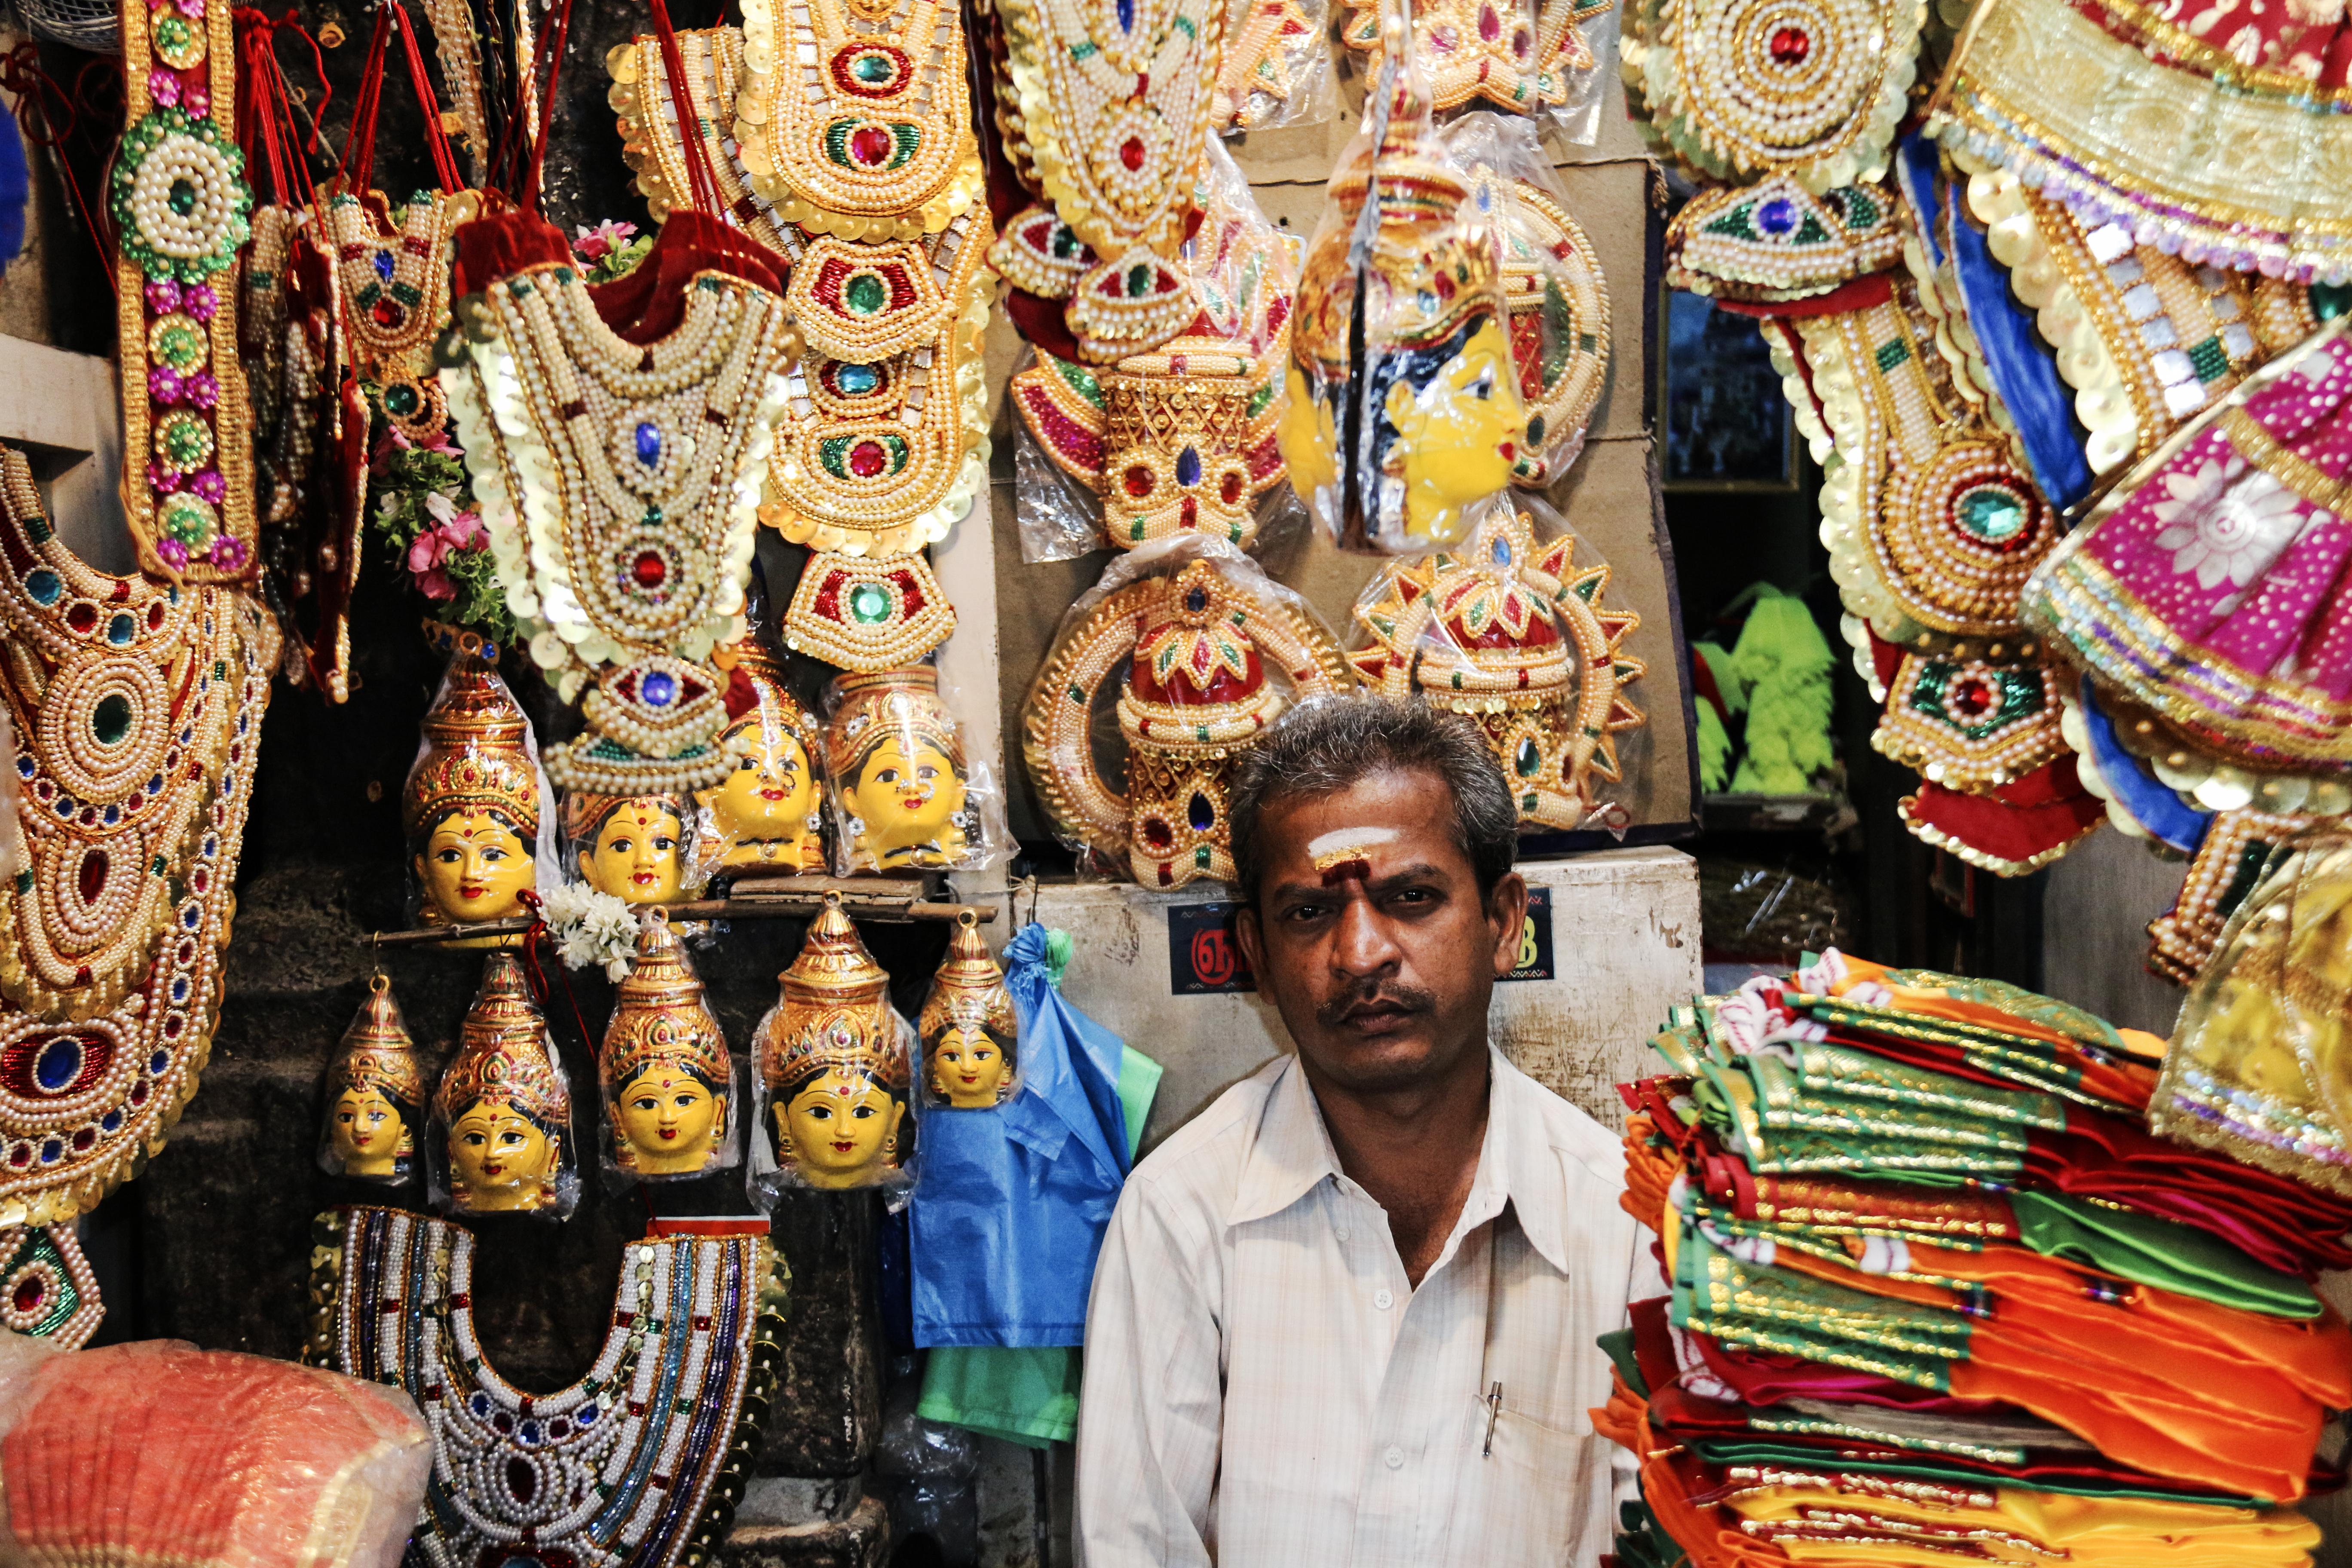 Tamil Nadu, India